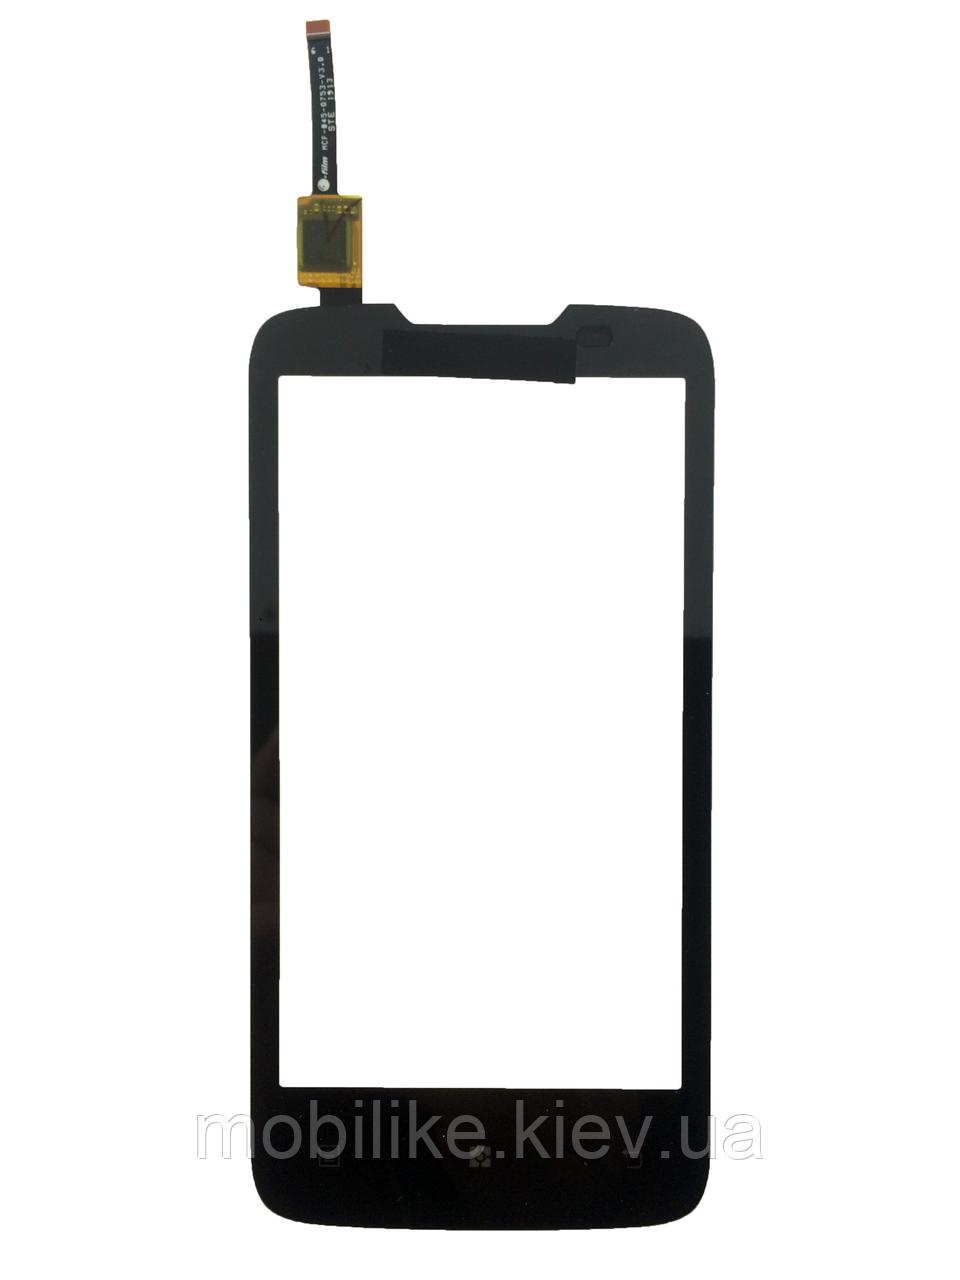 Сенсорний екран Lenovo A820 чорний